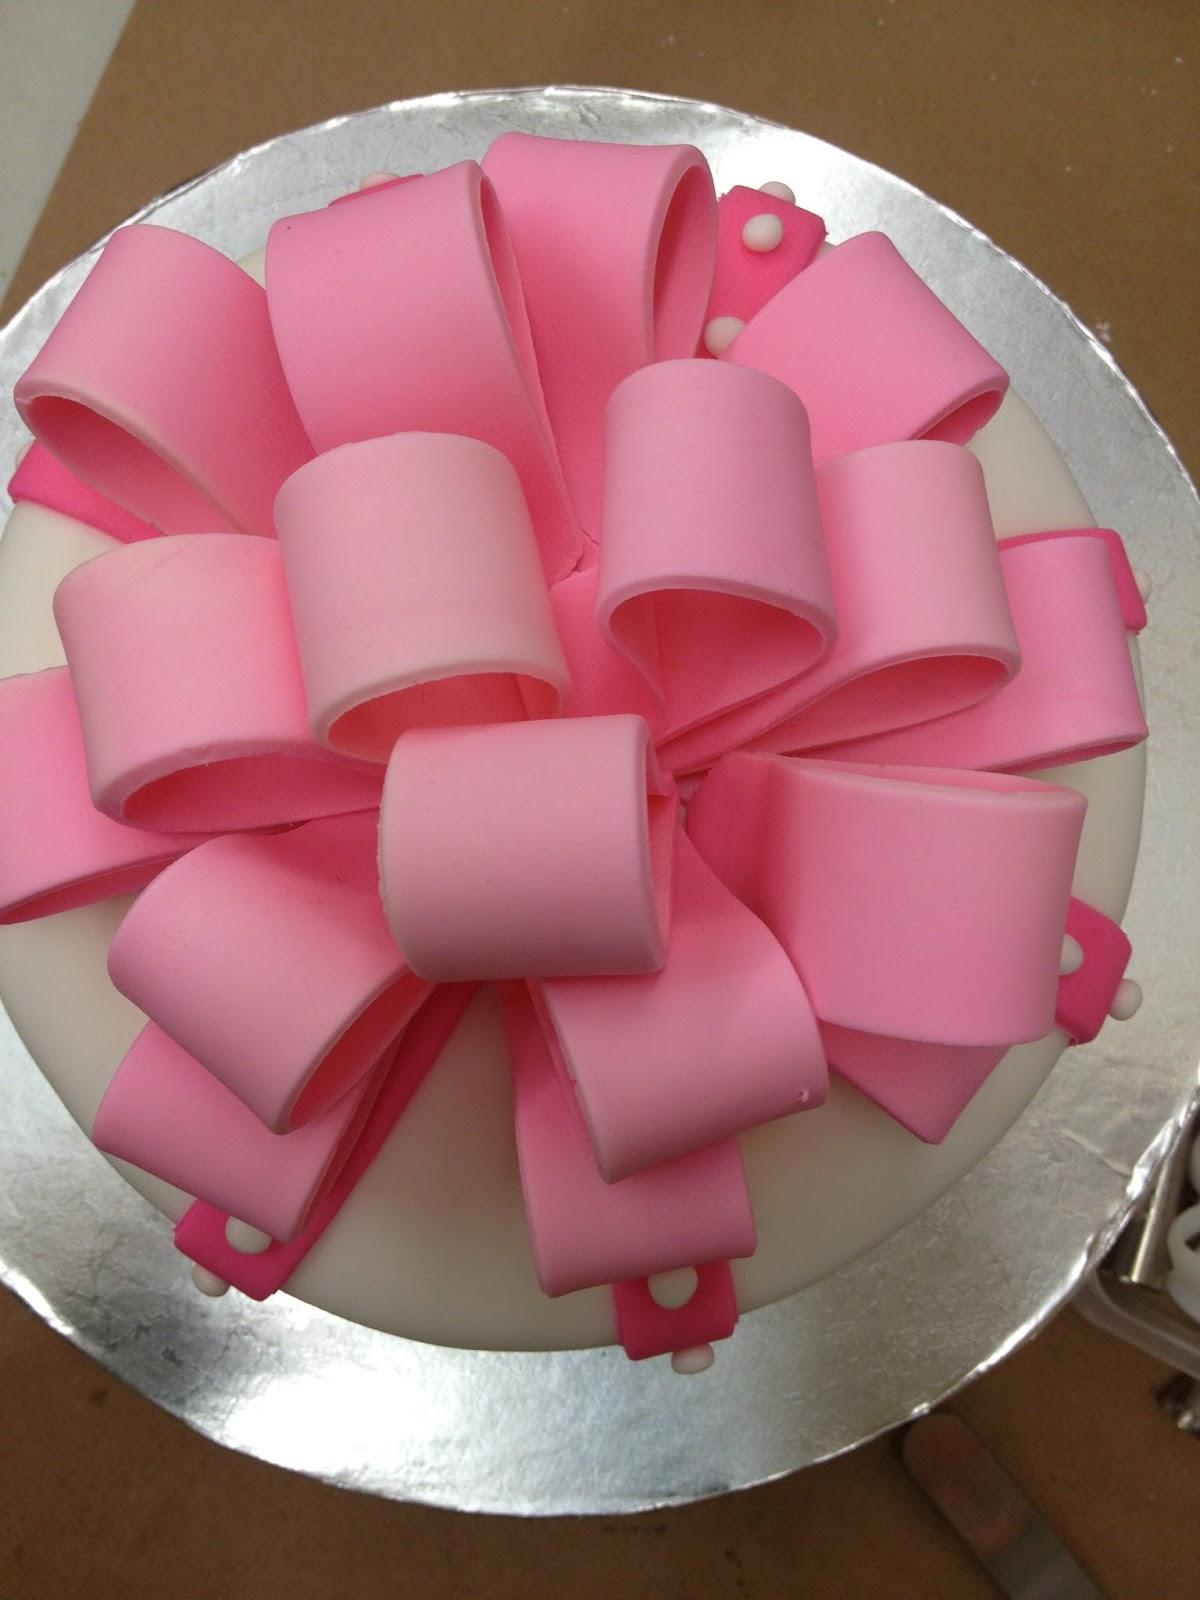 JesNesCakes: Fondant Bow Vanilla Cake with Strawberry Filling